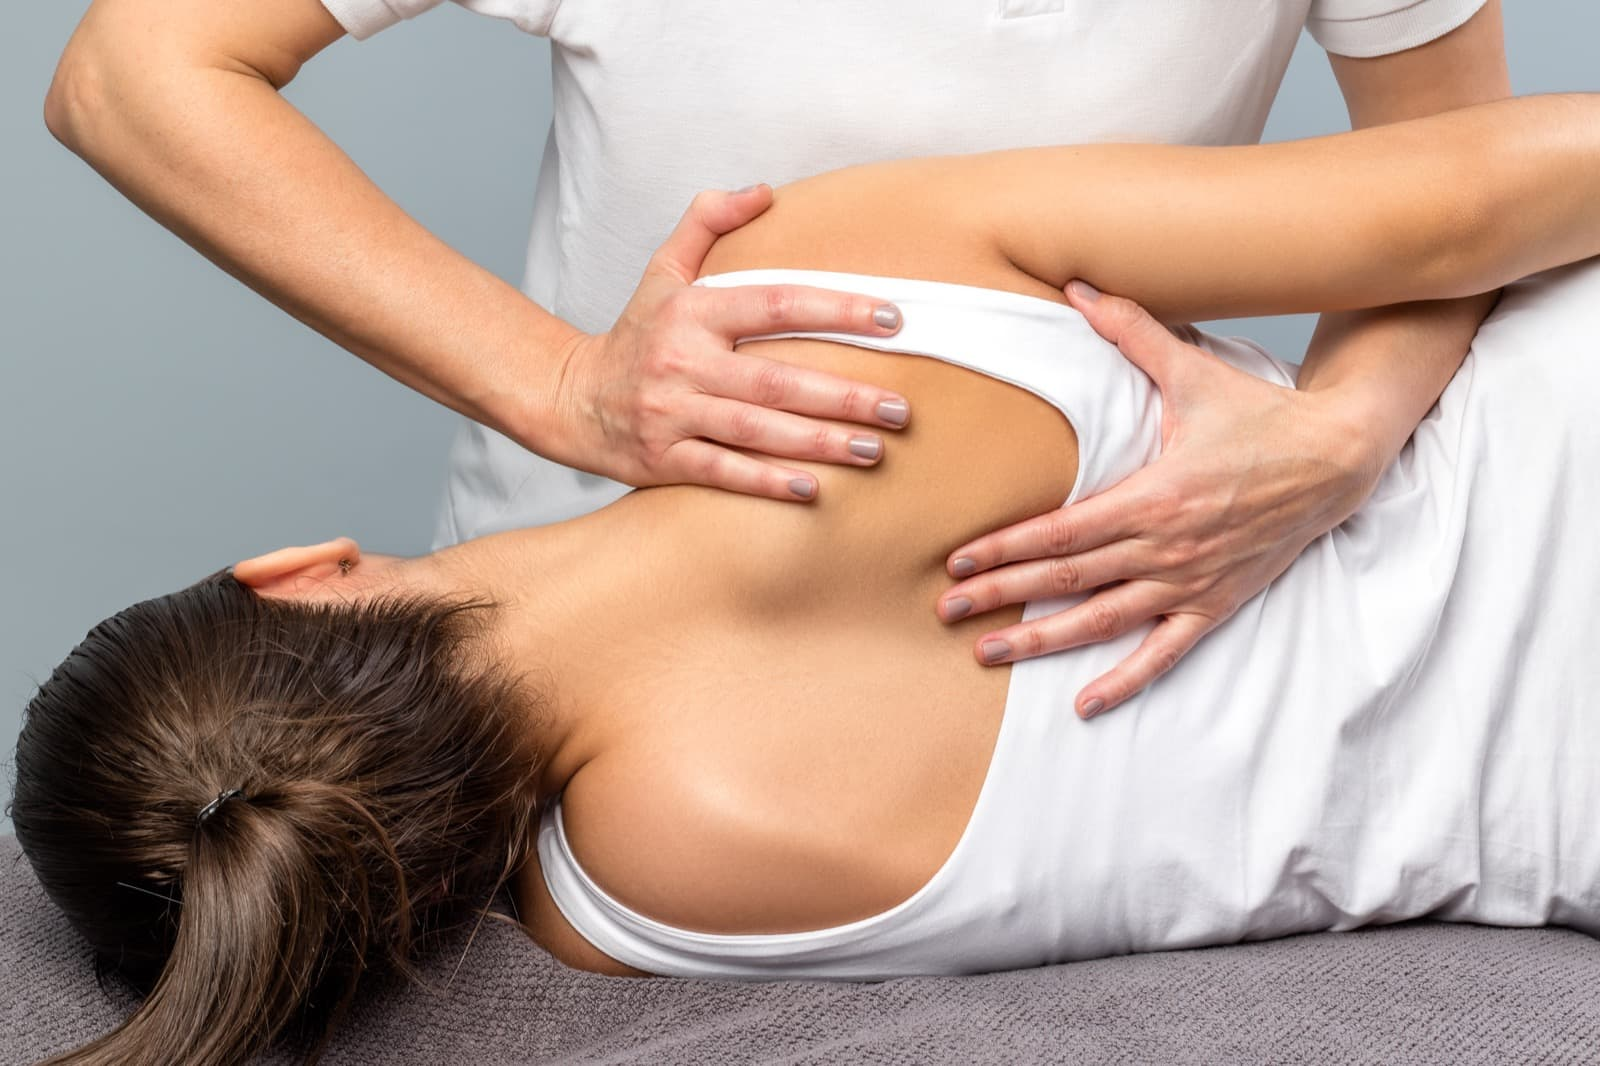 Conoscere l'osteopatia